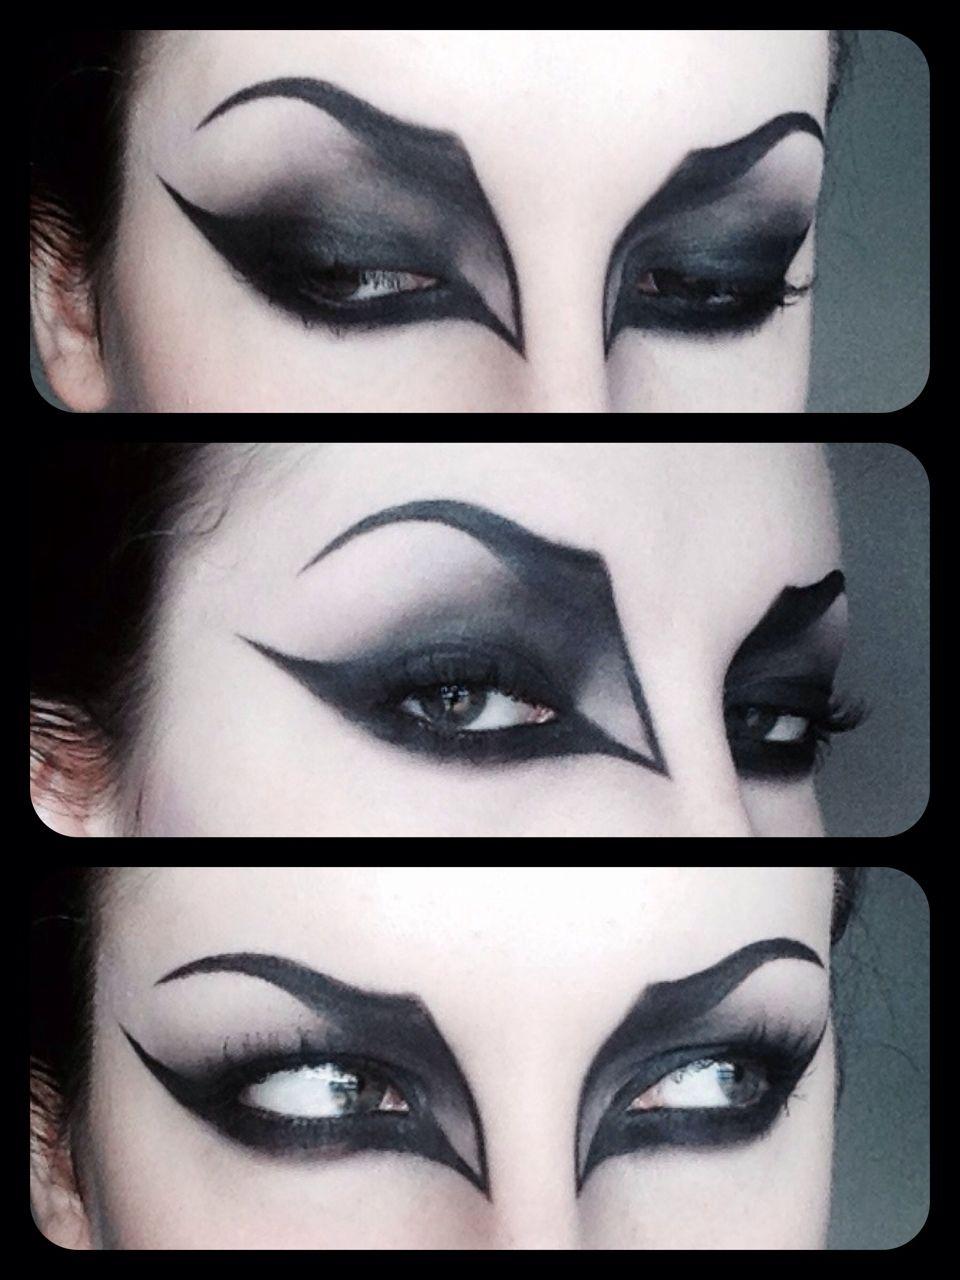 Maquillage des yeux de vampire halloween pinterest yeux de vampire maquillage des yeux et - Maquillage vampire halloween ...